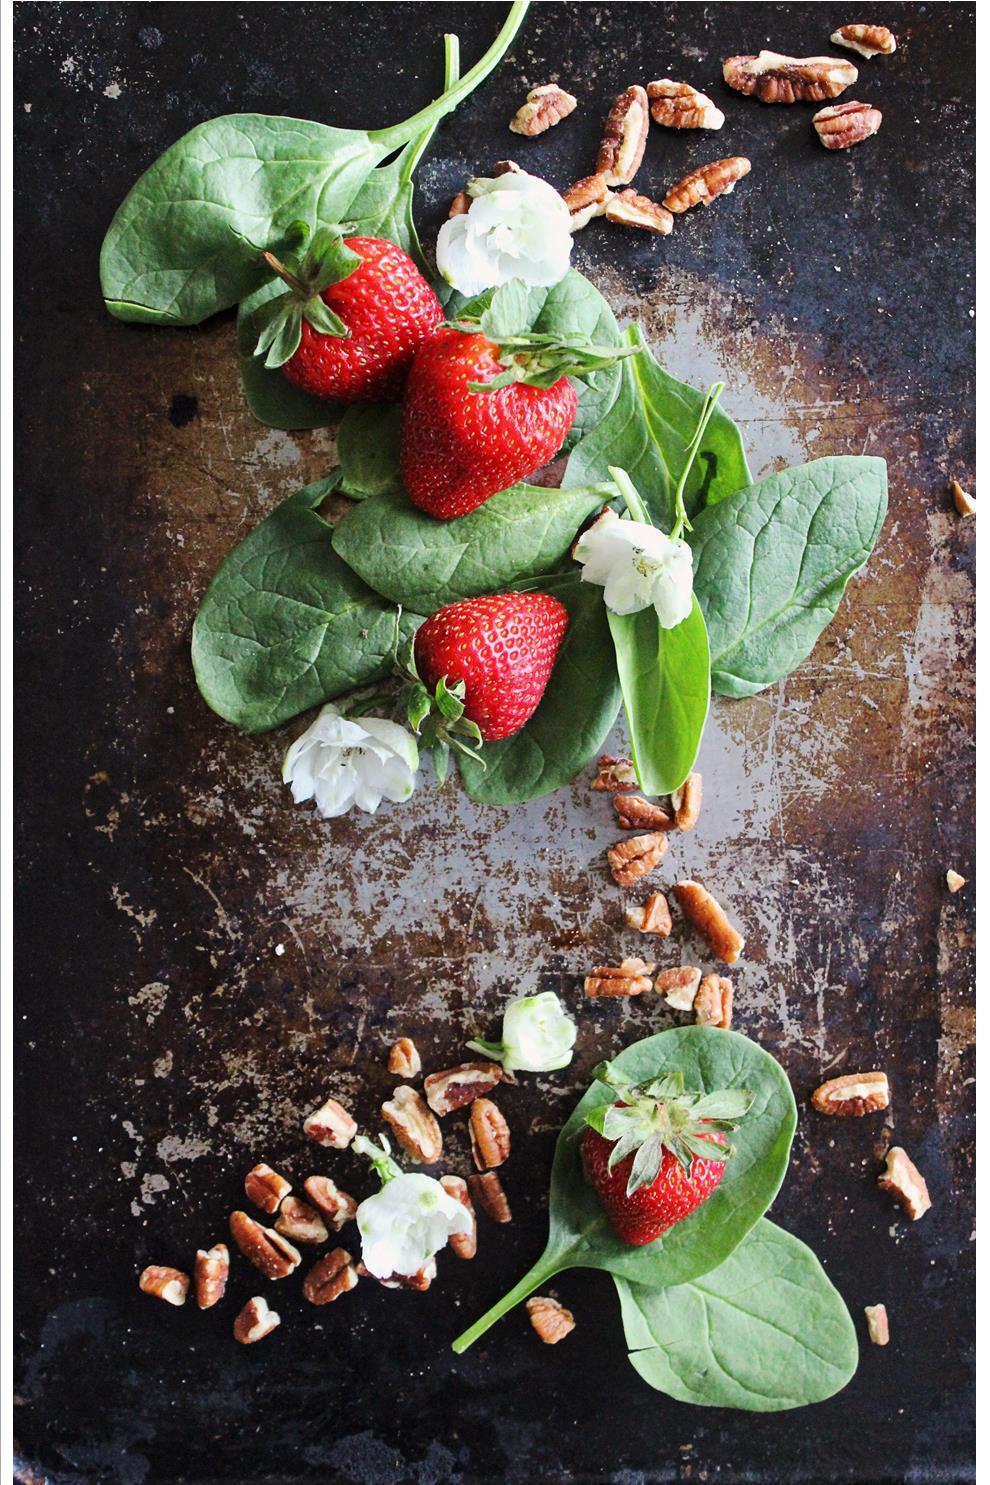 berry salad mbphotgraphy.jpg